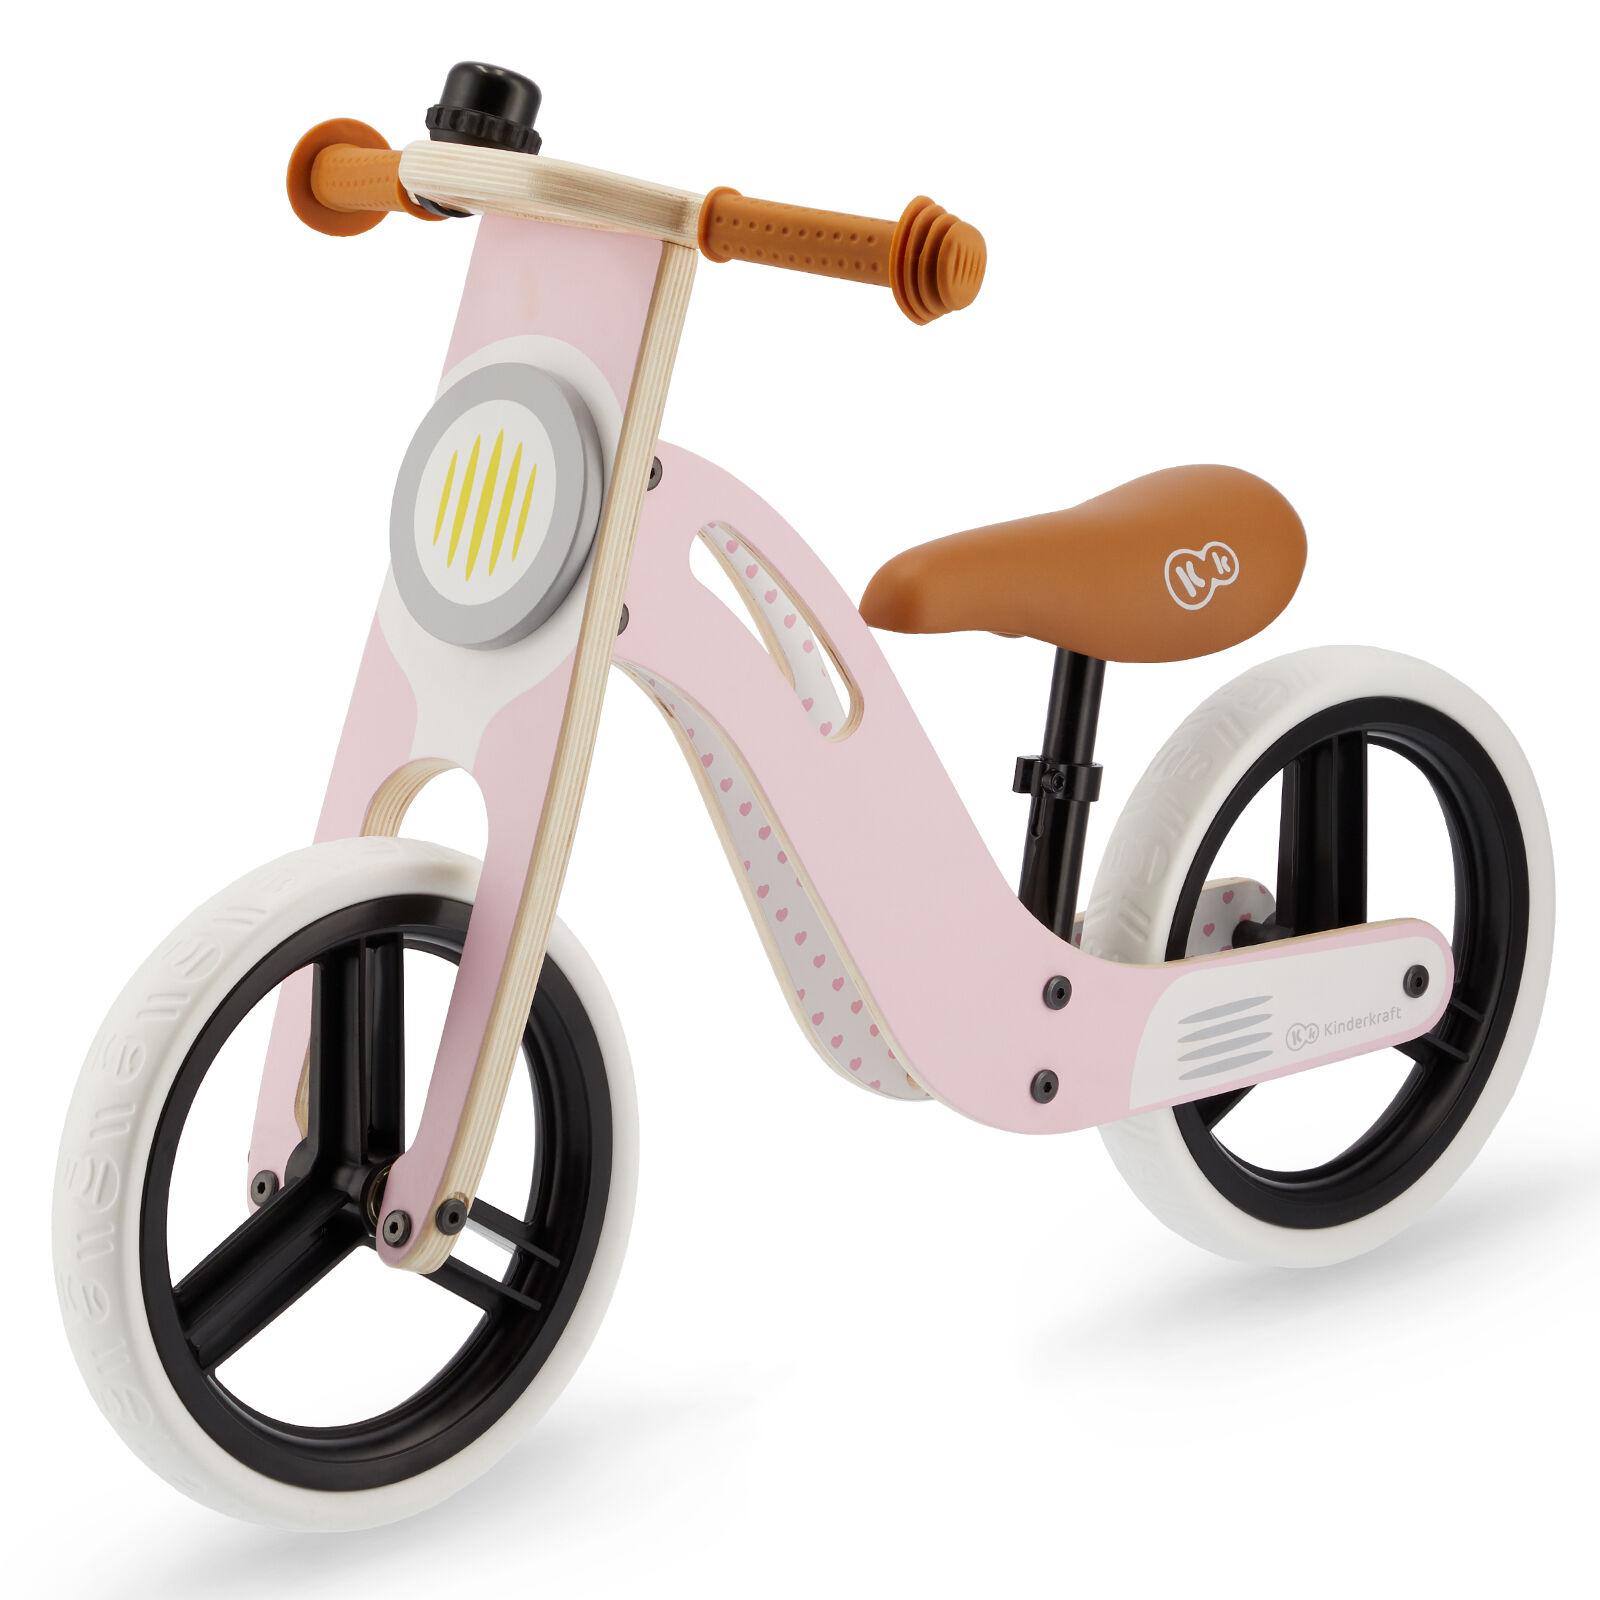 Kinderkraft Uniq Wooden Balance Bike - Pink